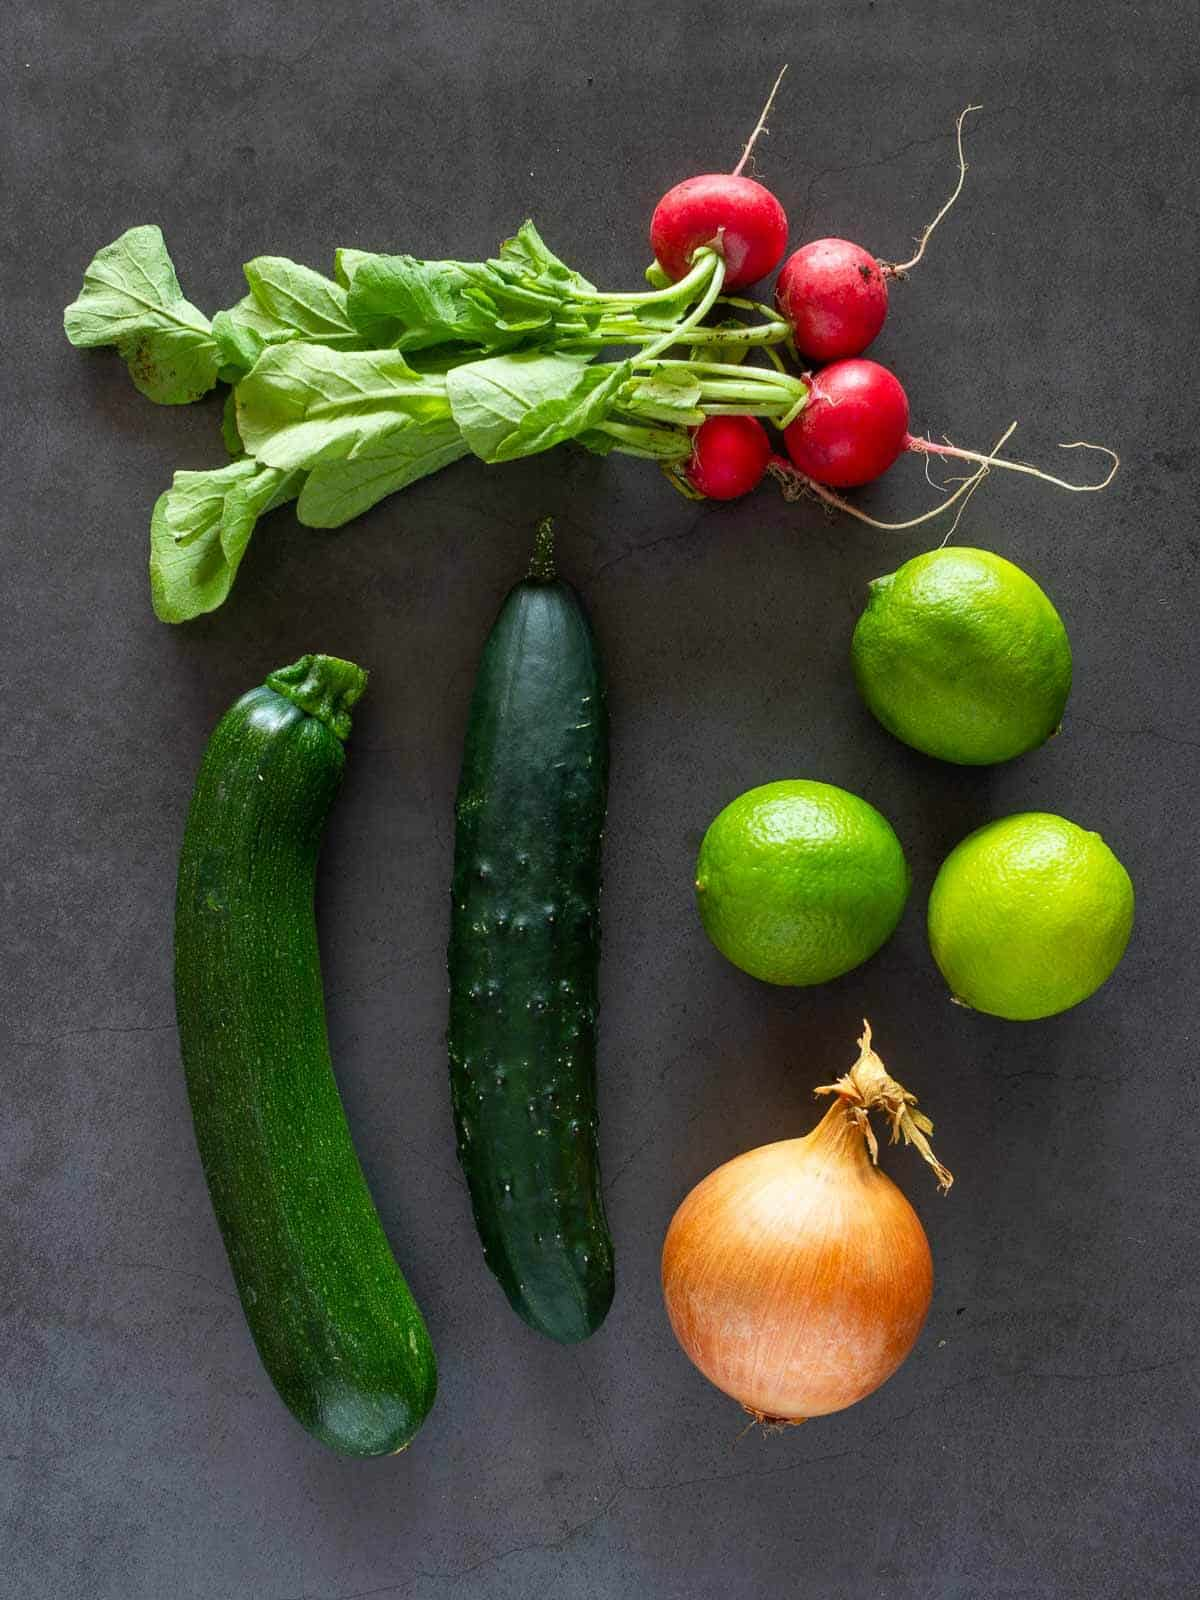 Vegan Ceviche Ingredients